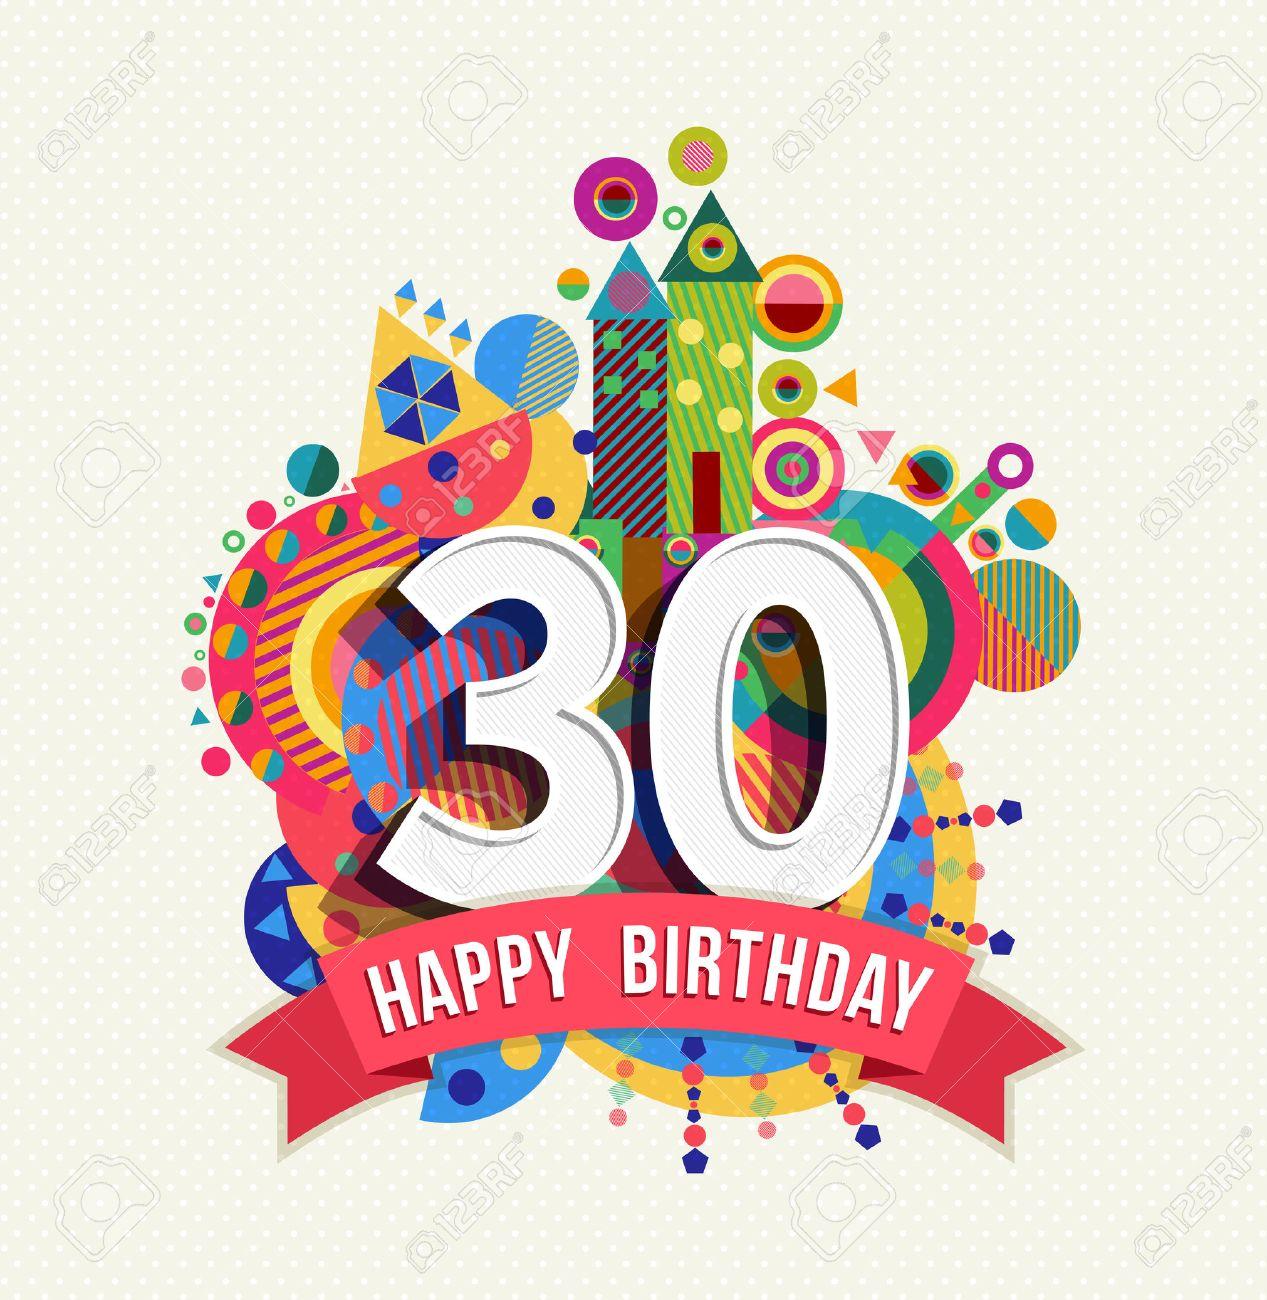 Cumpleanos De Treinta 30 Anos Tarjeta De Felicitacion De La - Tarjeta-cumpleanos